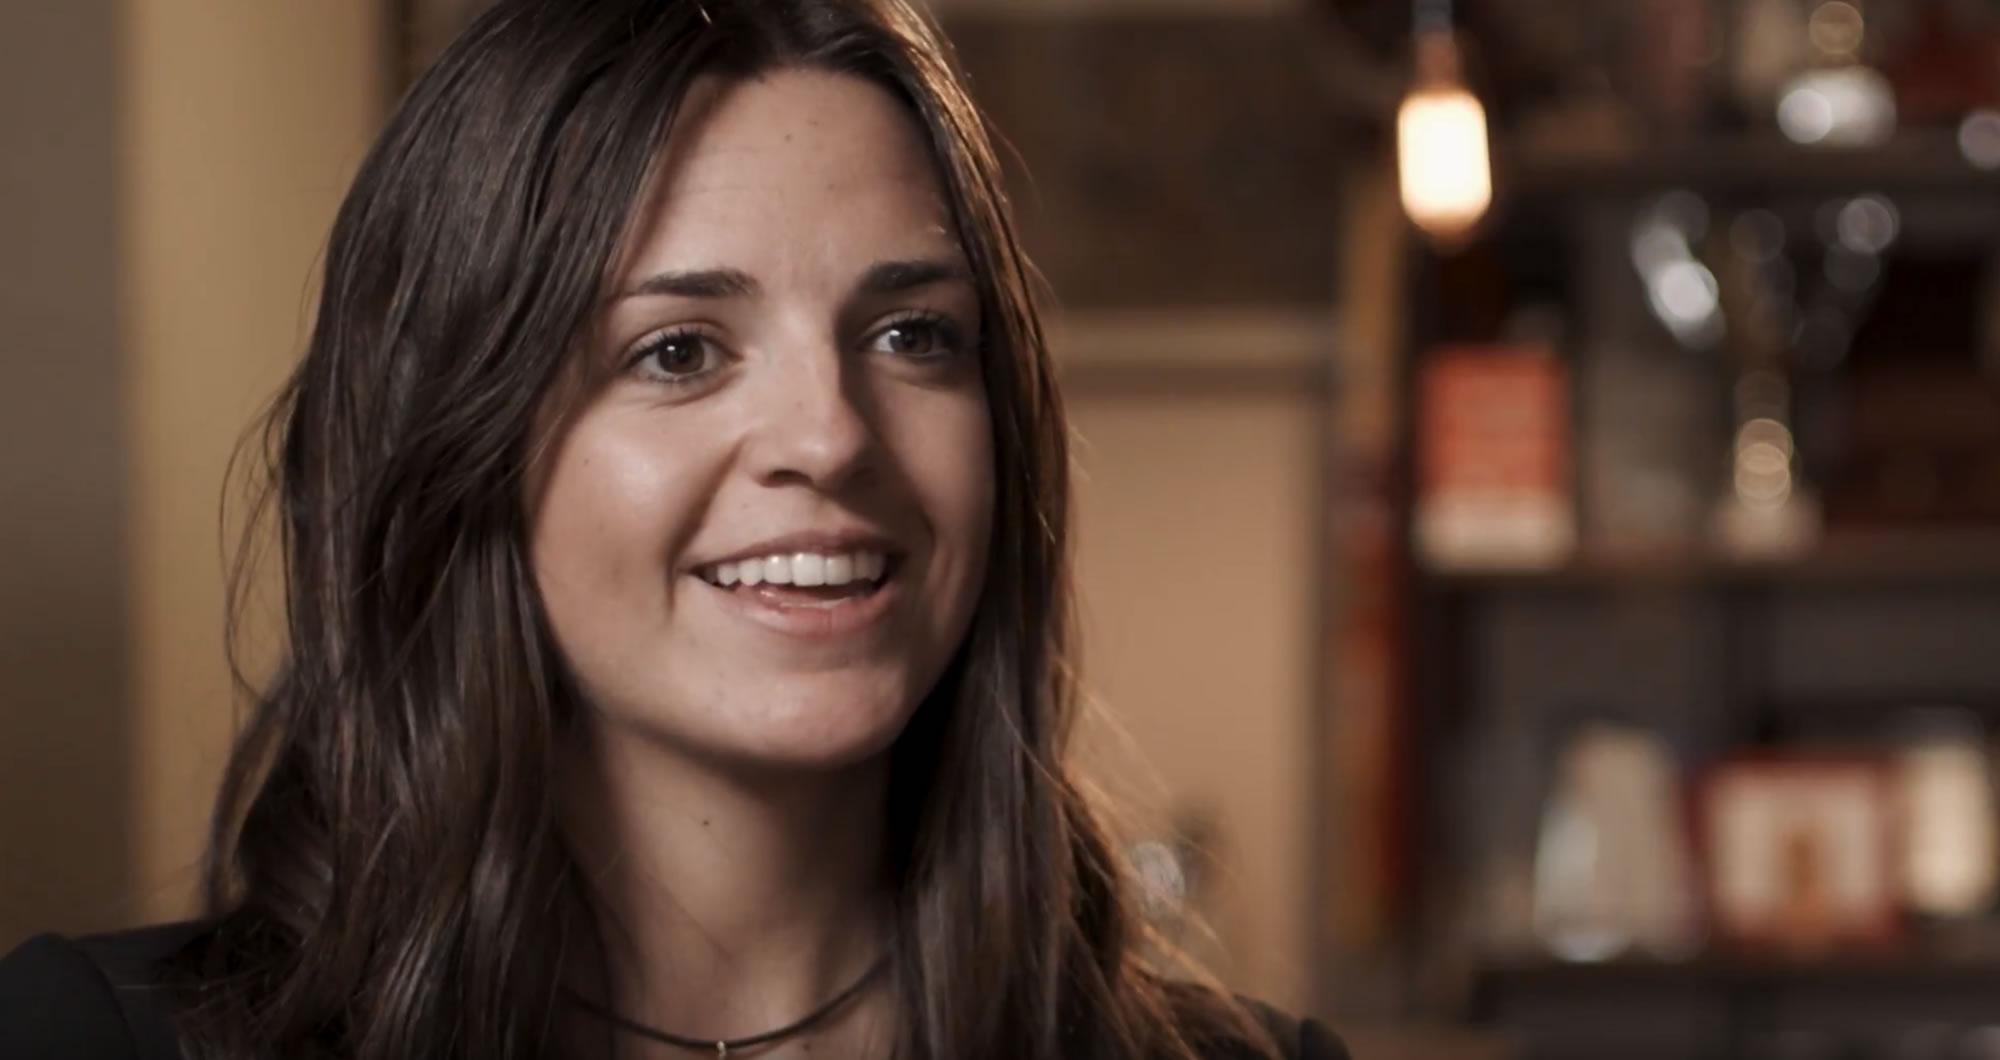 Cristina Gutiérrez. Primera Mujer Española En Terminar El Dakar